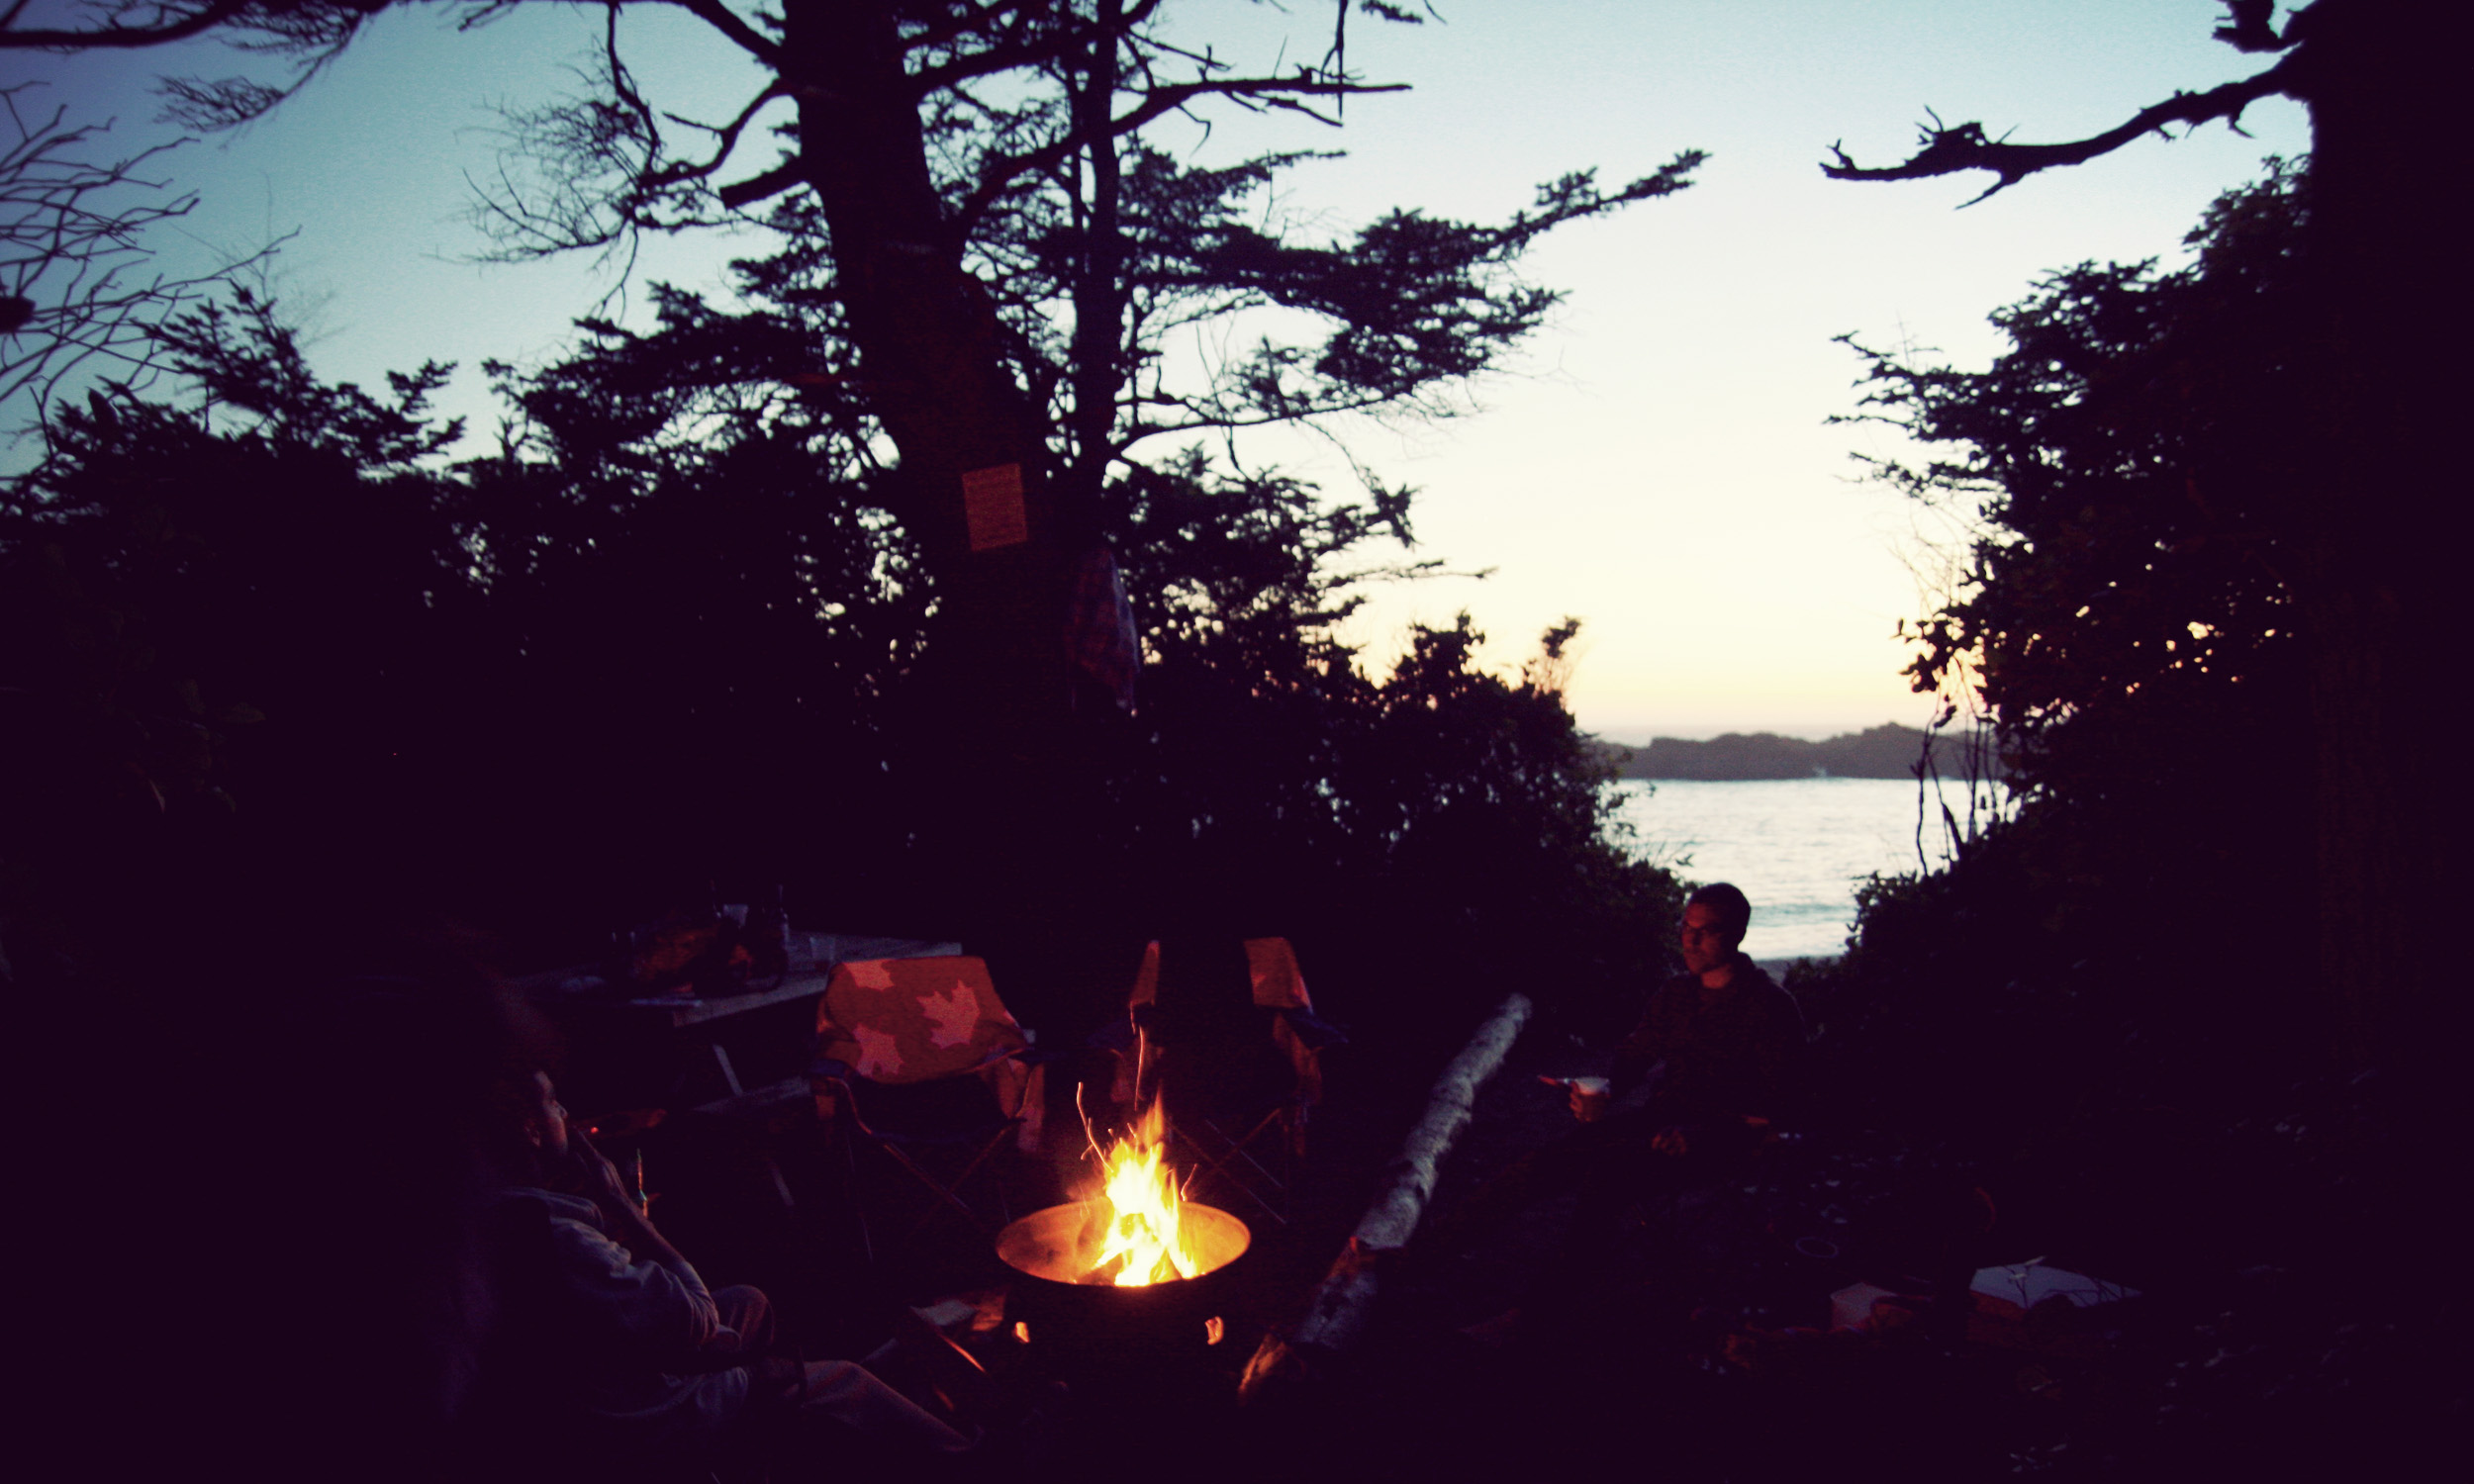 Wya-Point-Evening_01.jpg